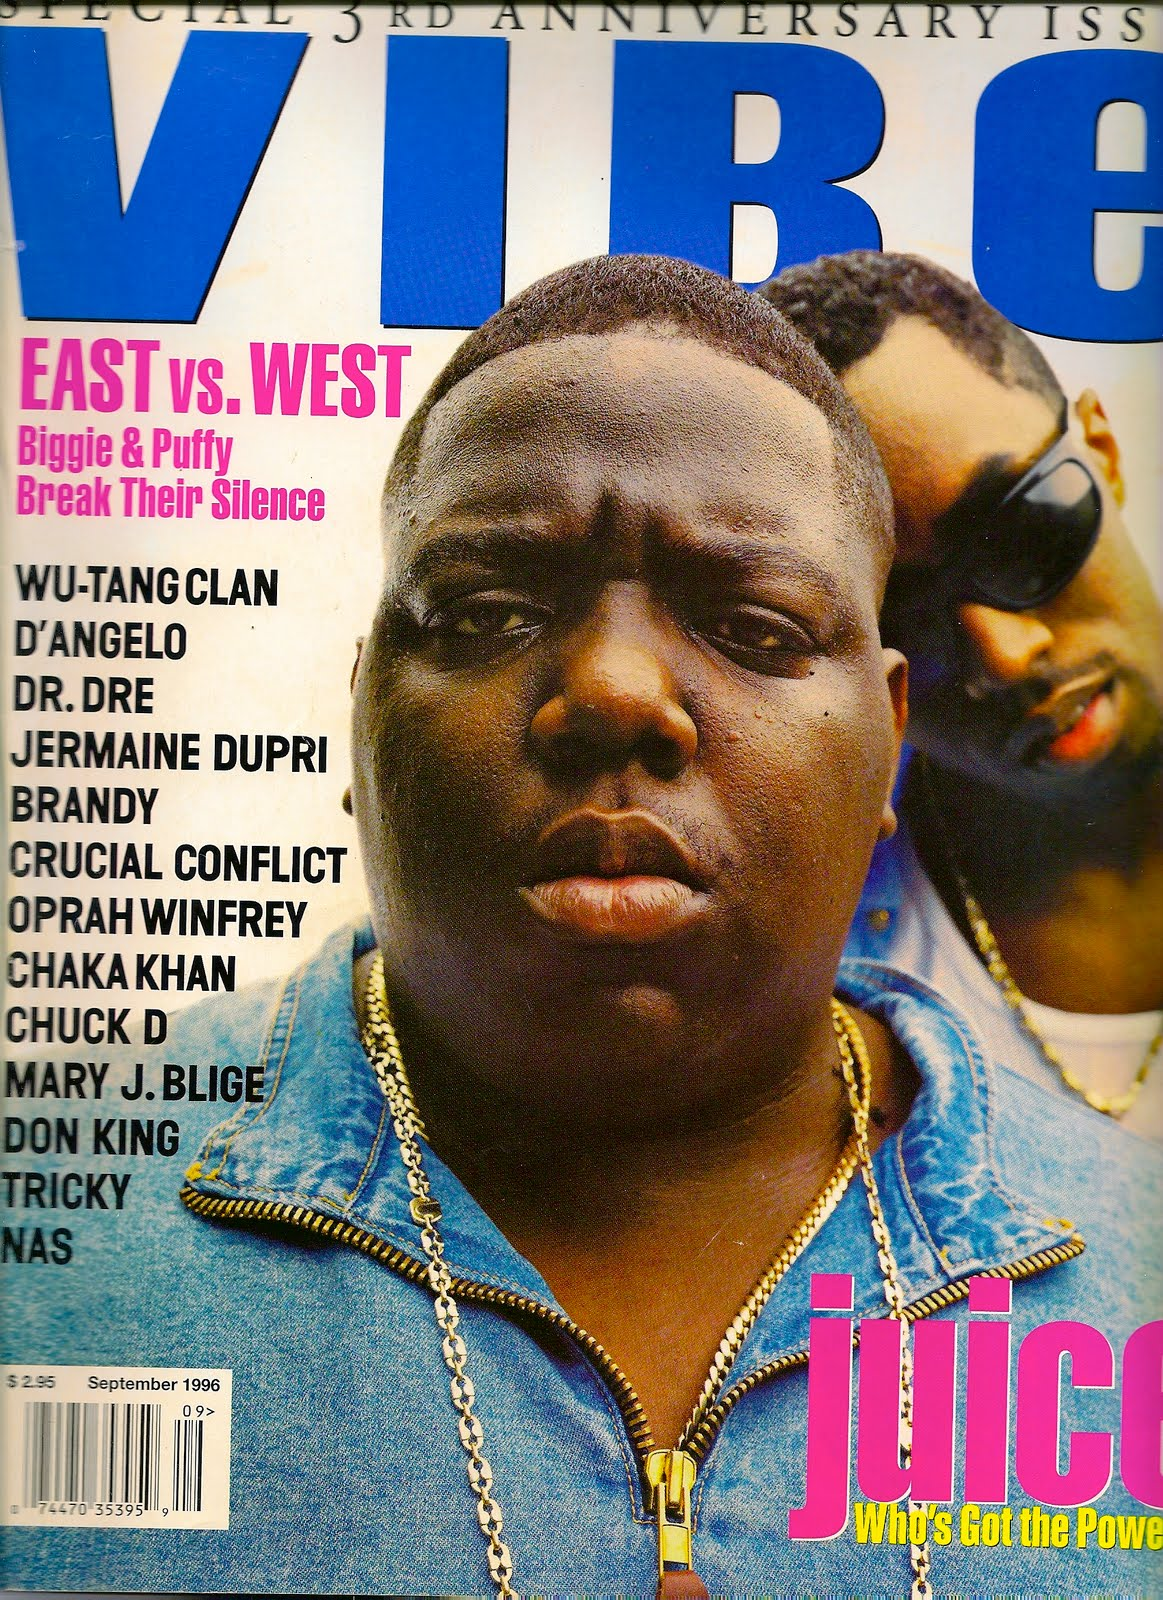 The Notorious B.I.G. « Battlerapstats.com